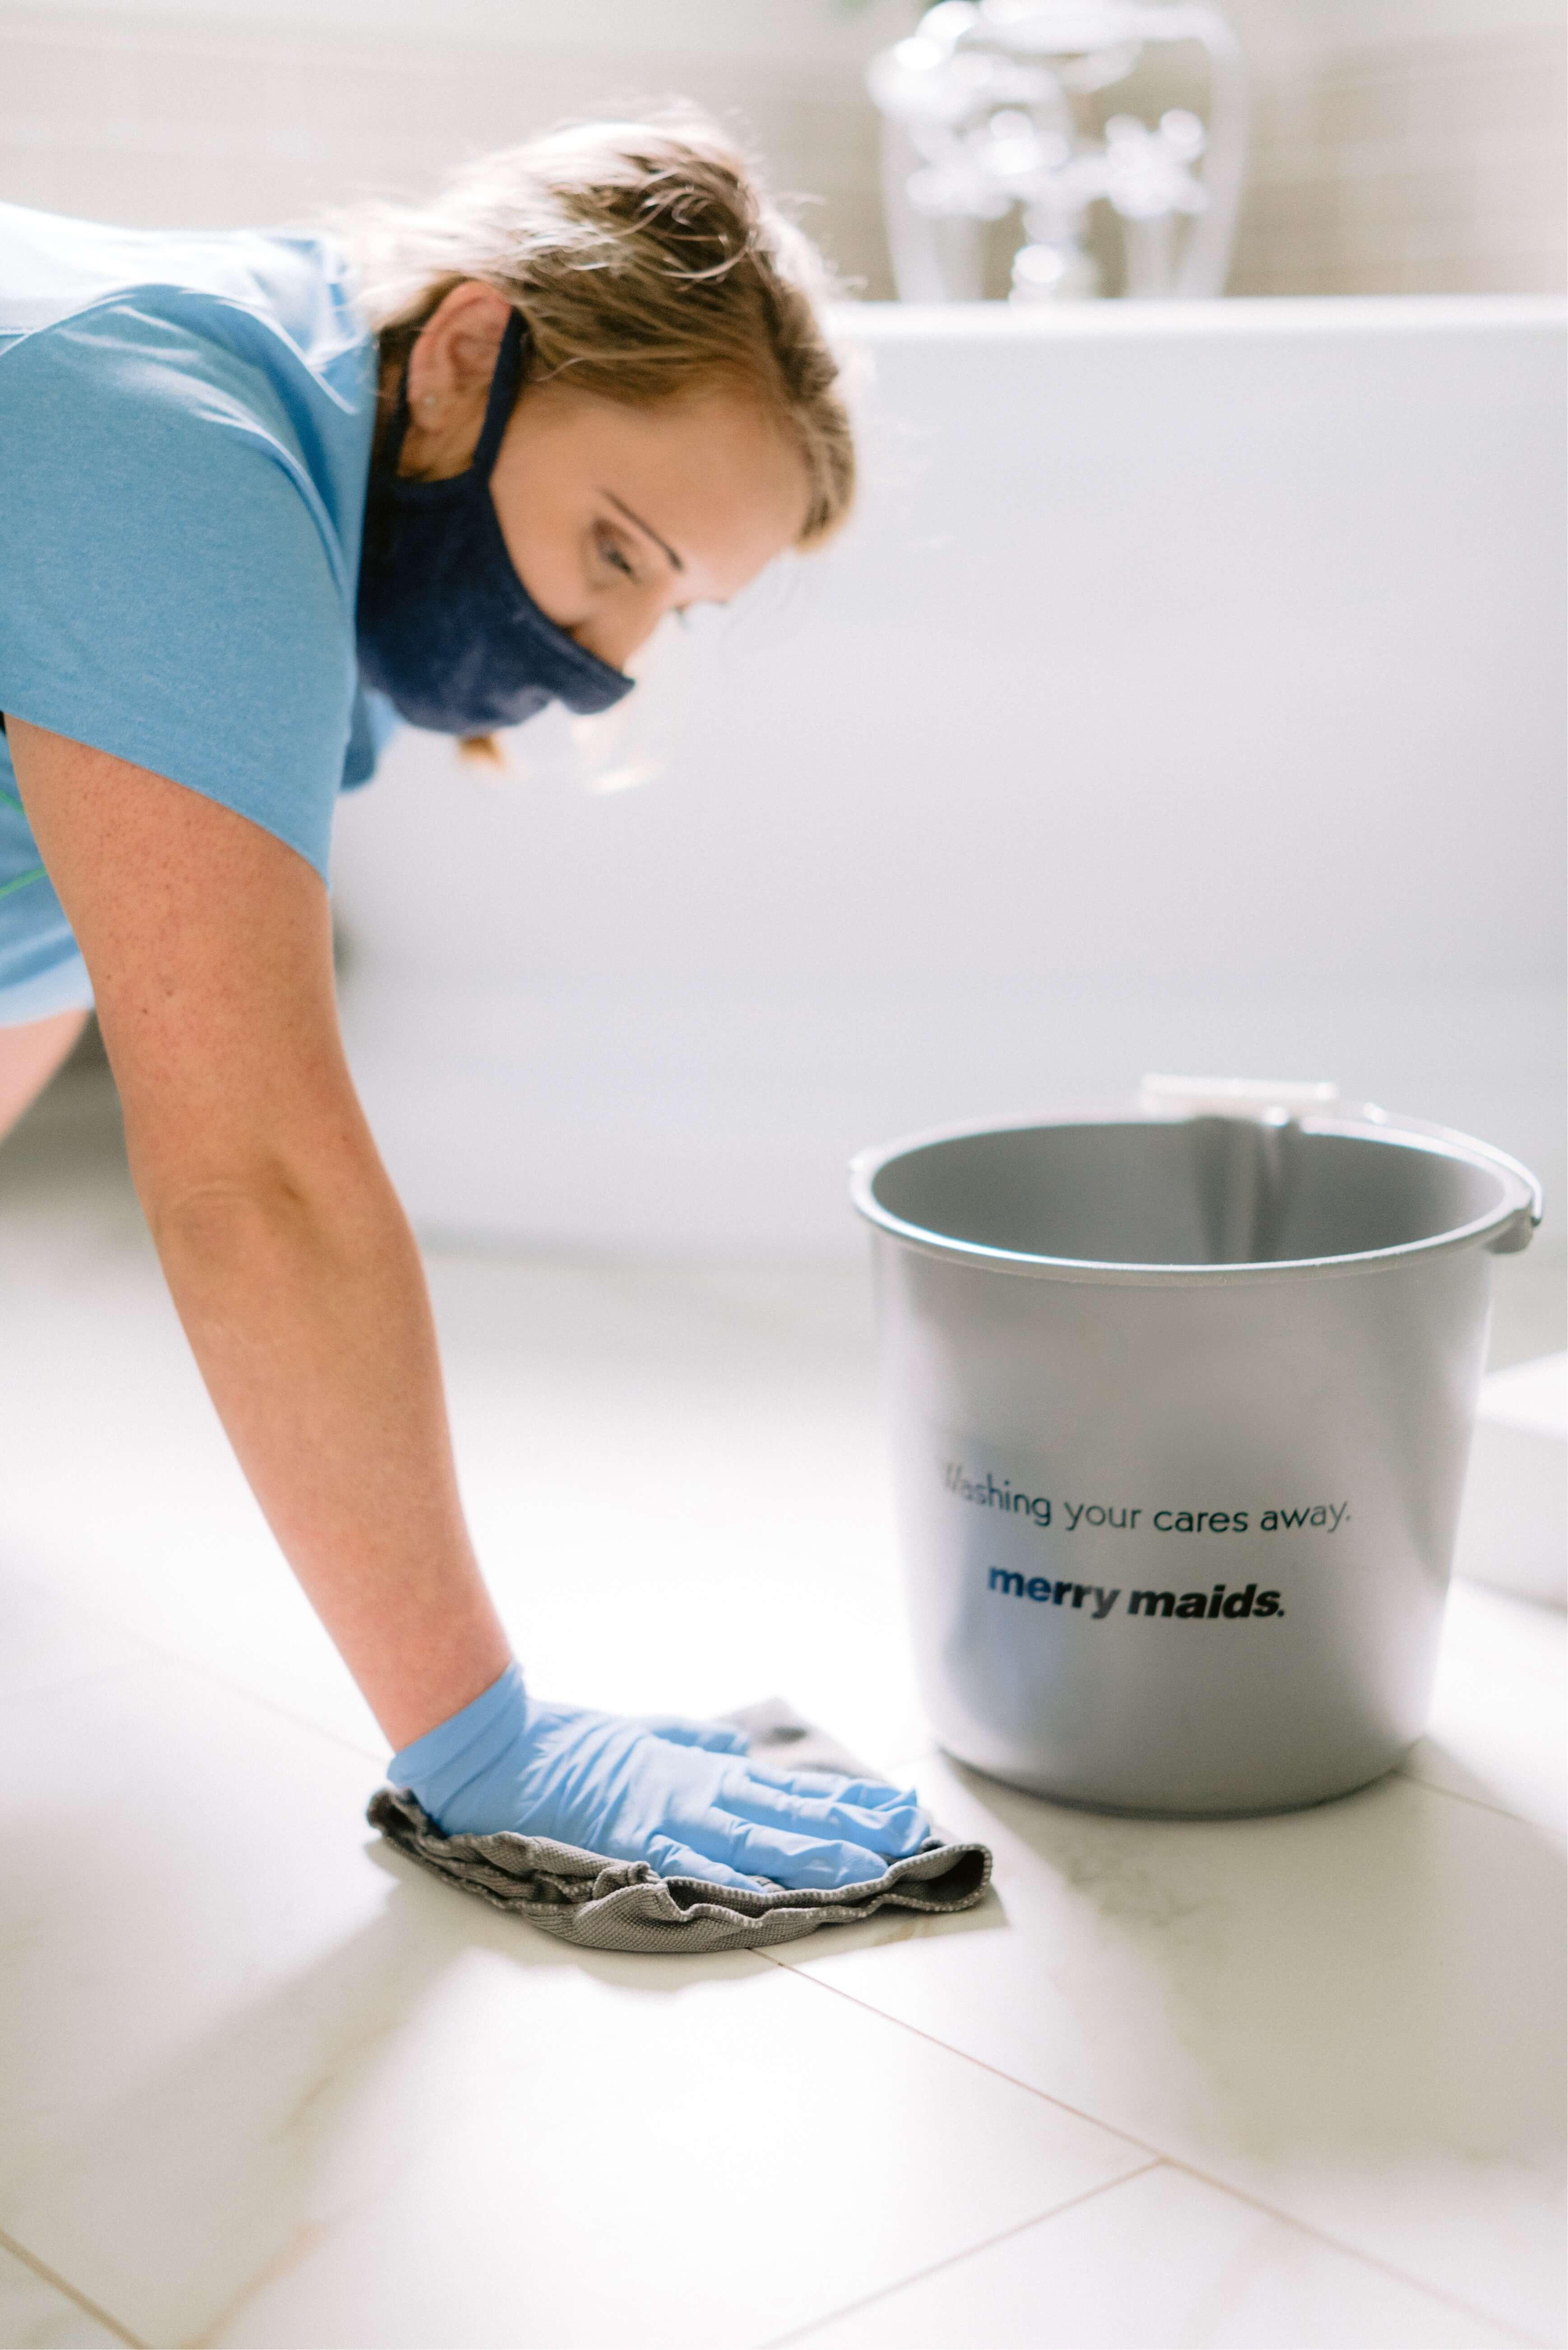 Merry Maids team member scrubbing tile floors